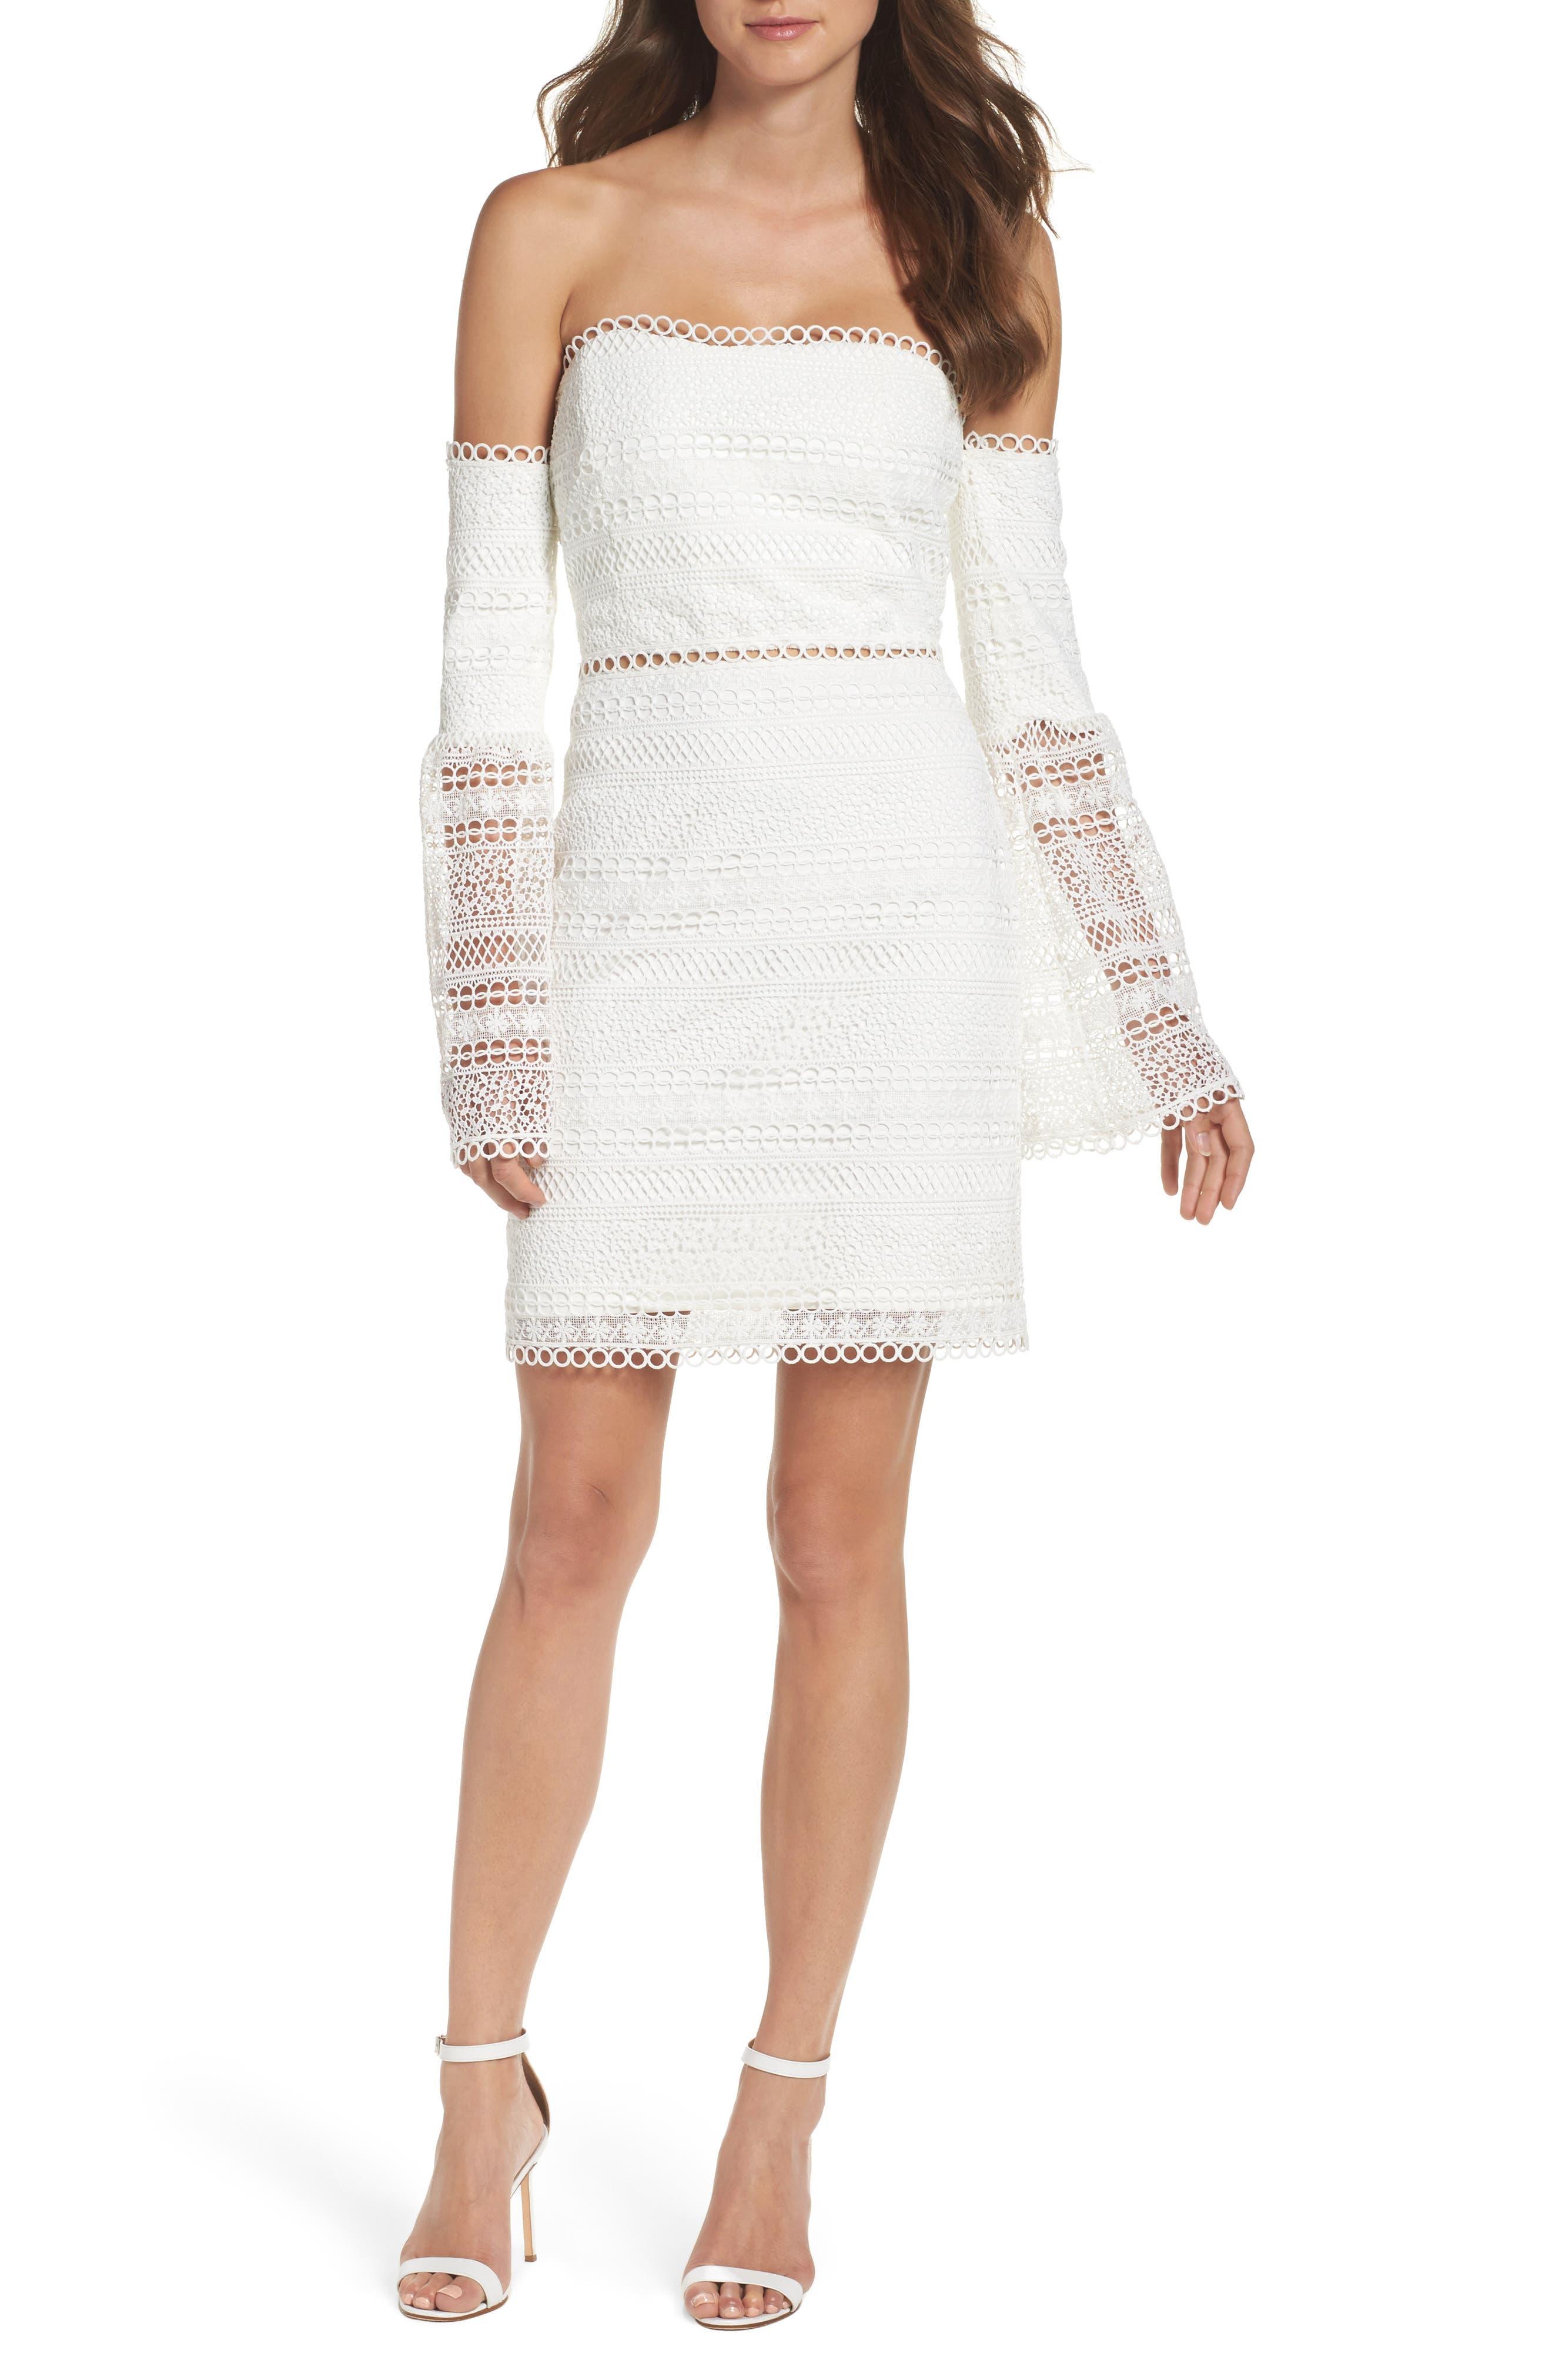 Catalina Lace Off the Shoulder Sheath Dress,                         Main,                         color, 100